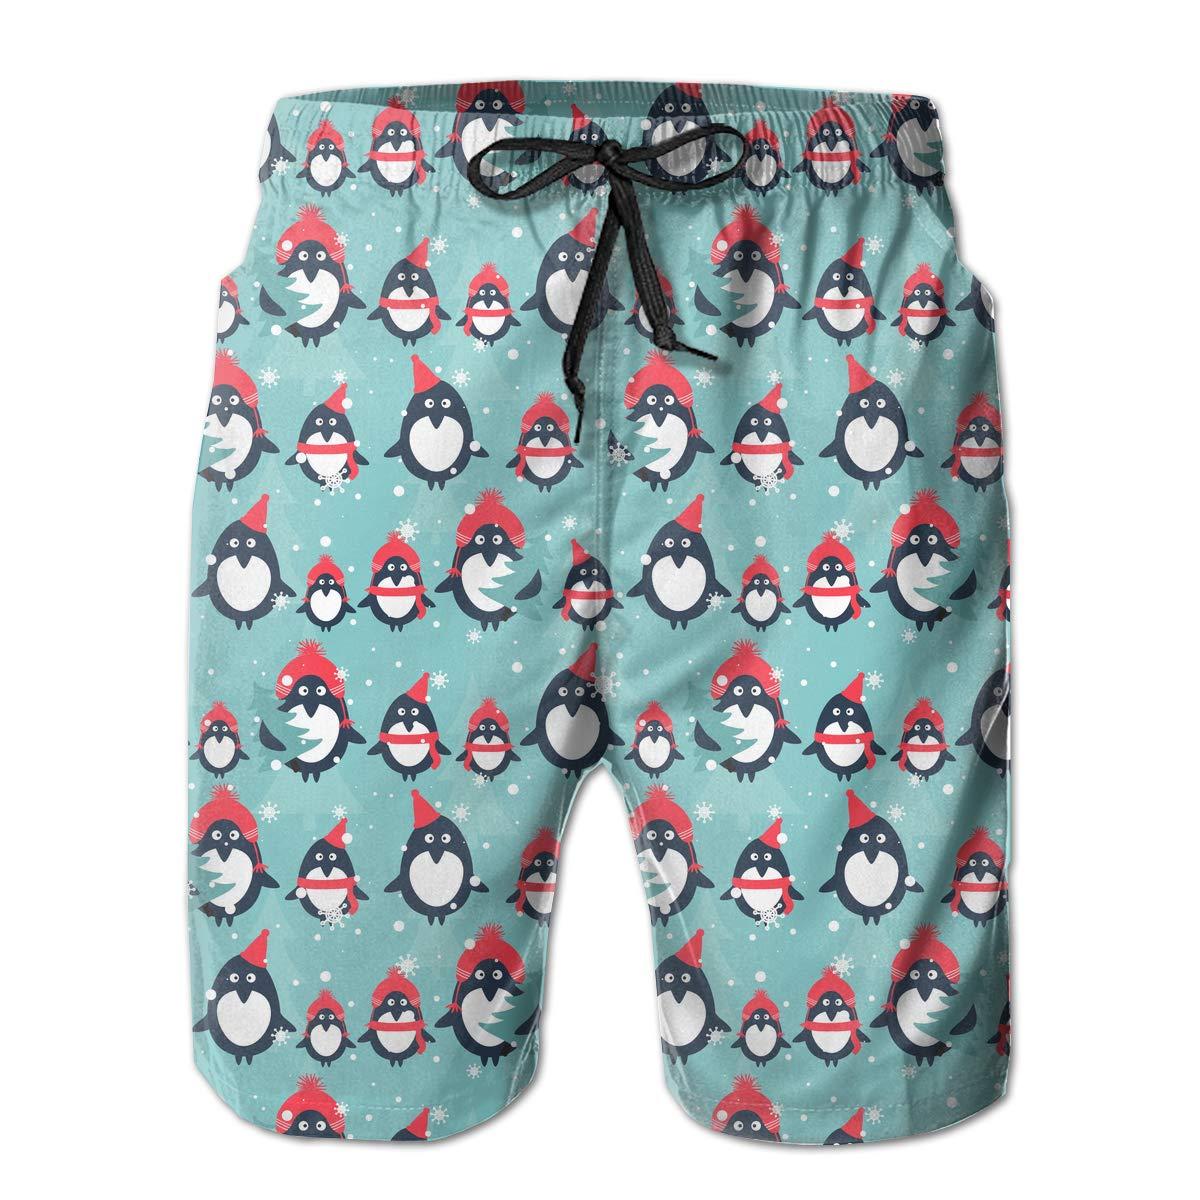 Polyester Penguins,fir Trees,Snow Pattern Beachwear with Pockets Xk7@KU Mens Quick Dry Beach Shorts